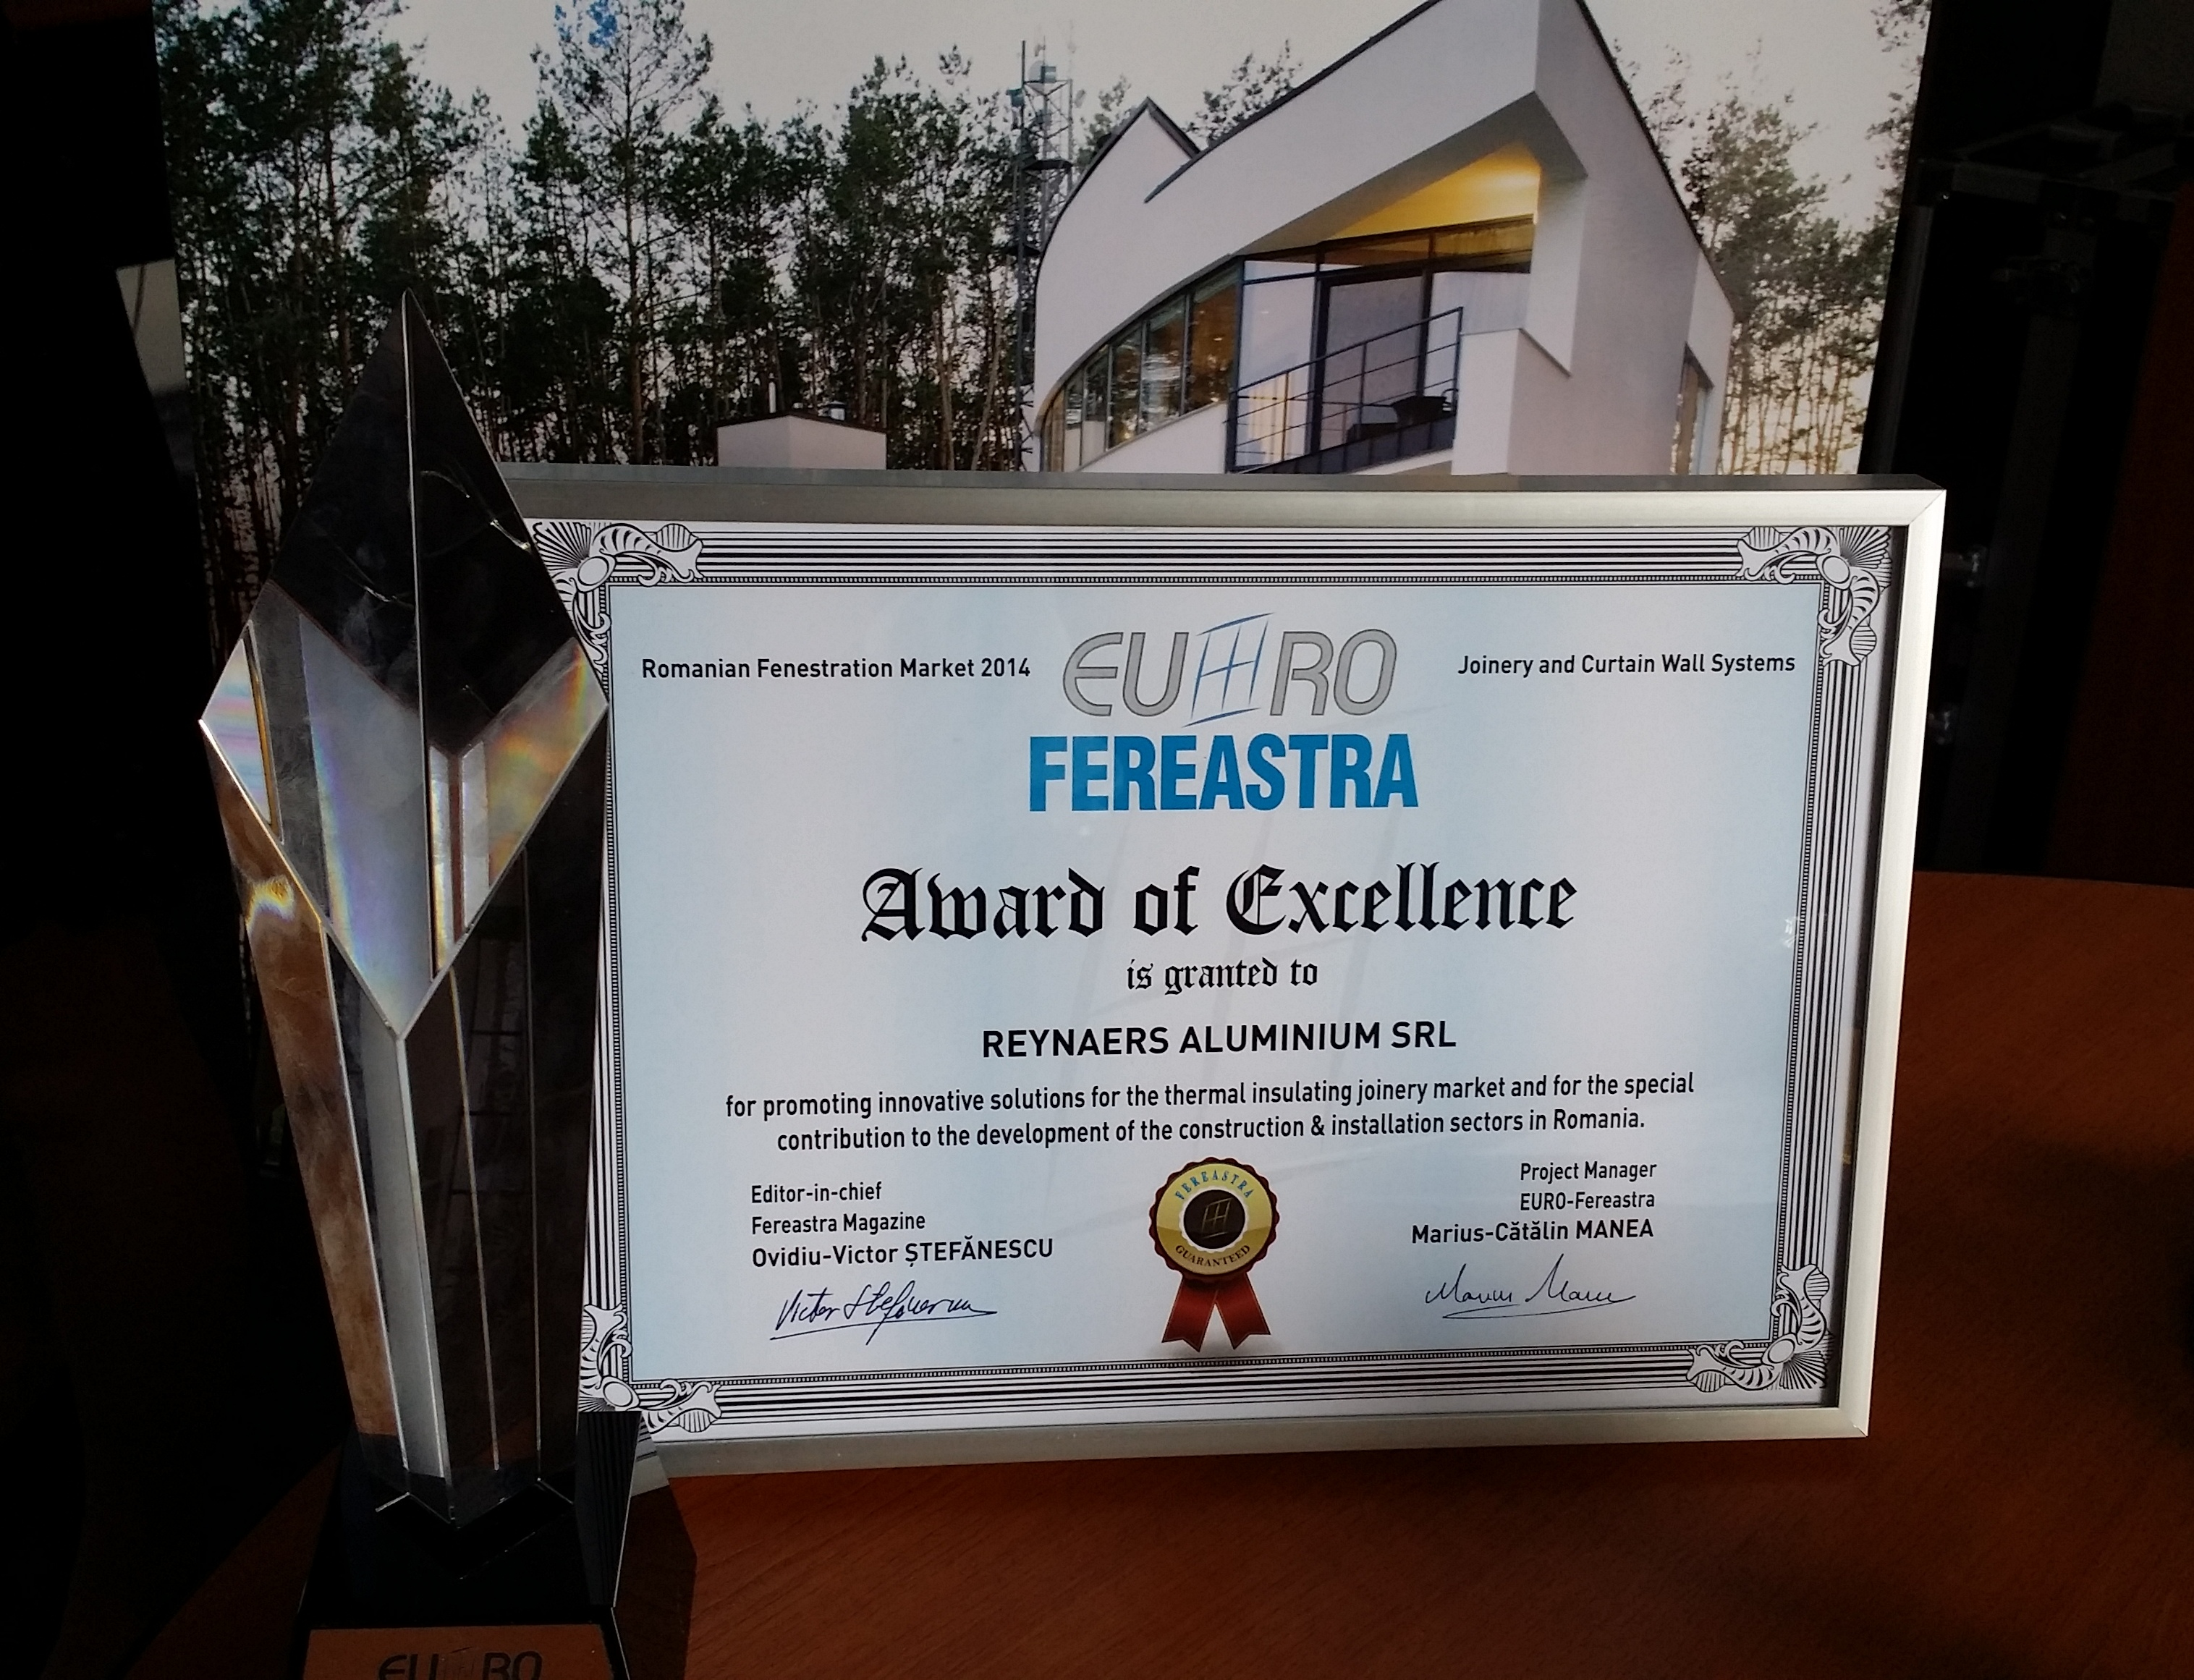 Premiul de Excelenta pentru Reynaers Aluminium - Premiul de Excelenta pentru Reynaers Aluminium